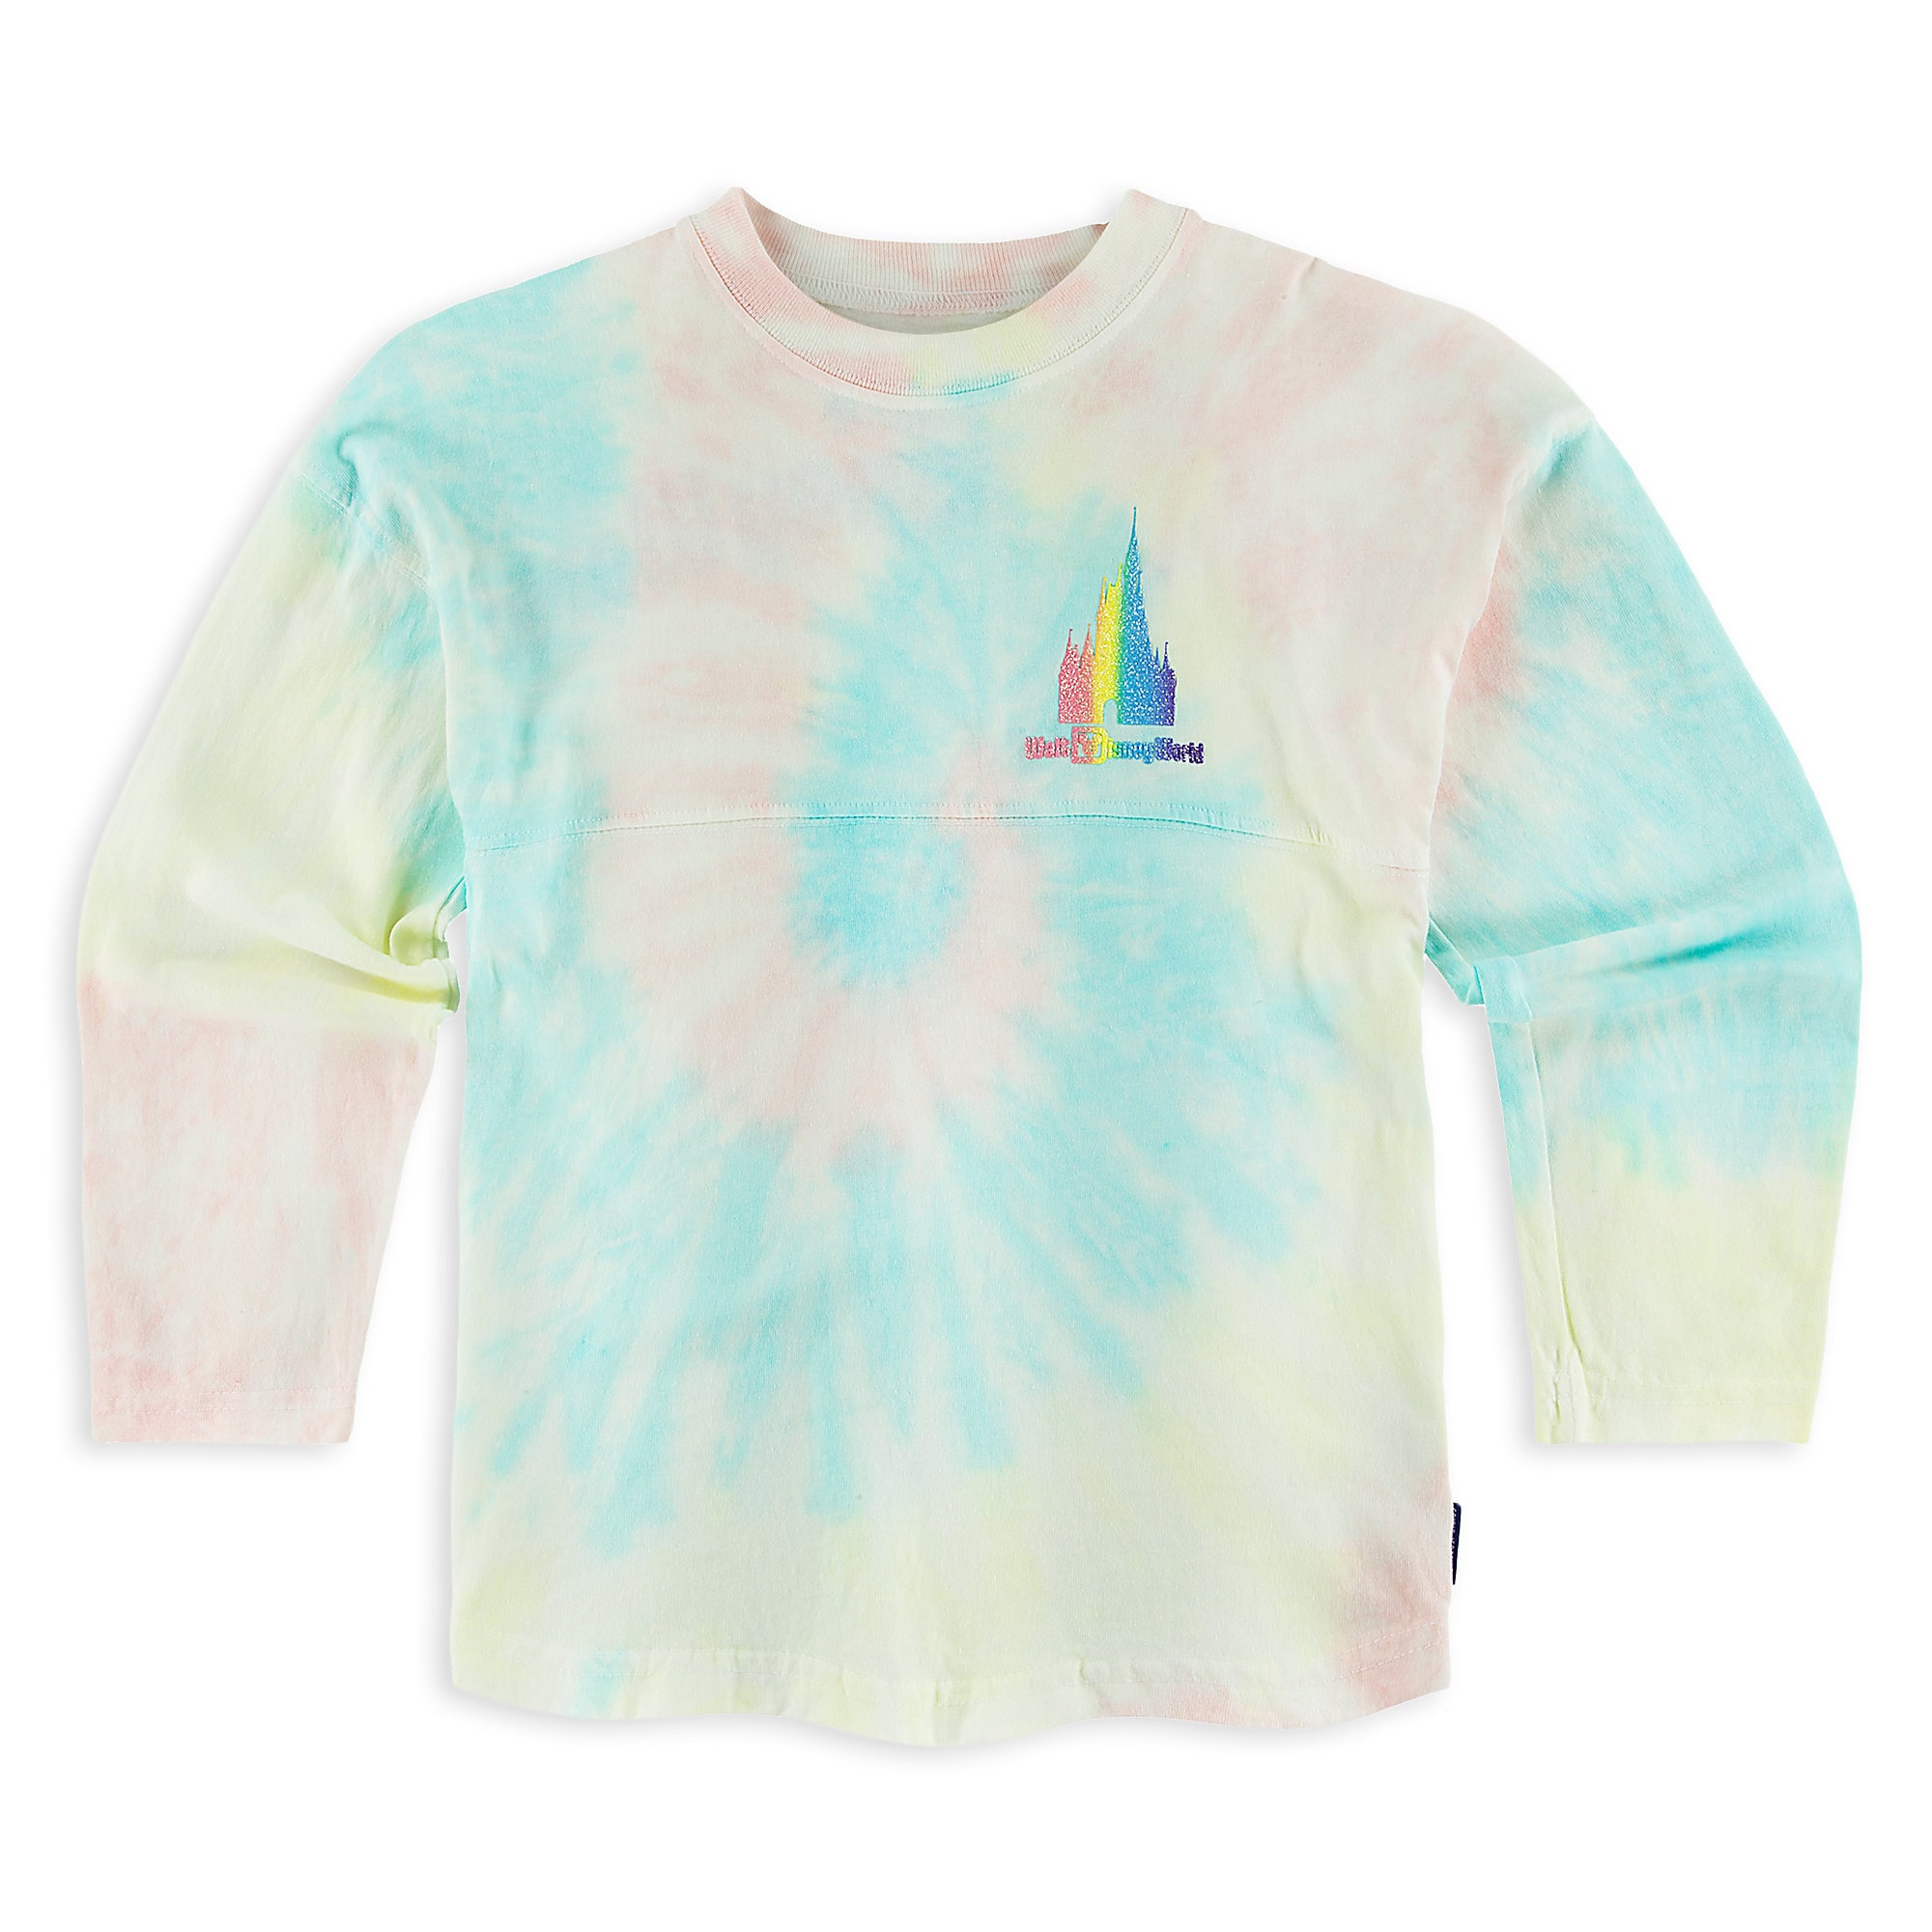 Walt Disney World Rainbow Spirit Jersey For Girls ShopDisney